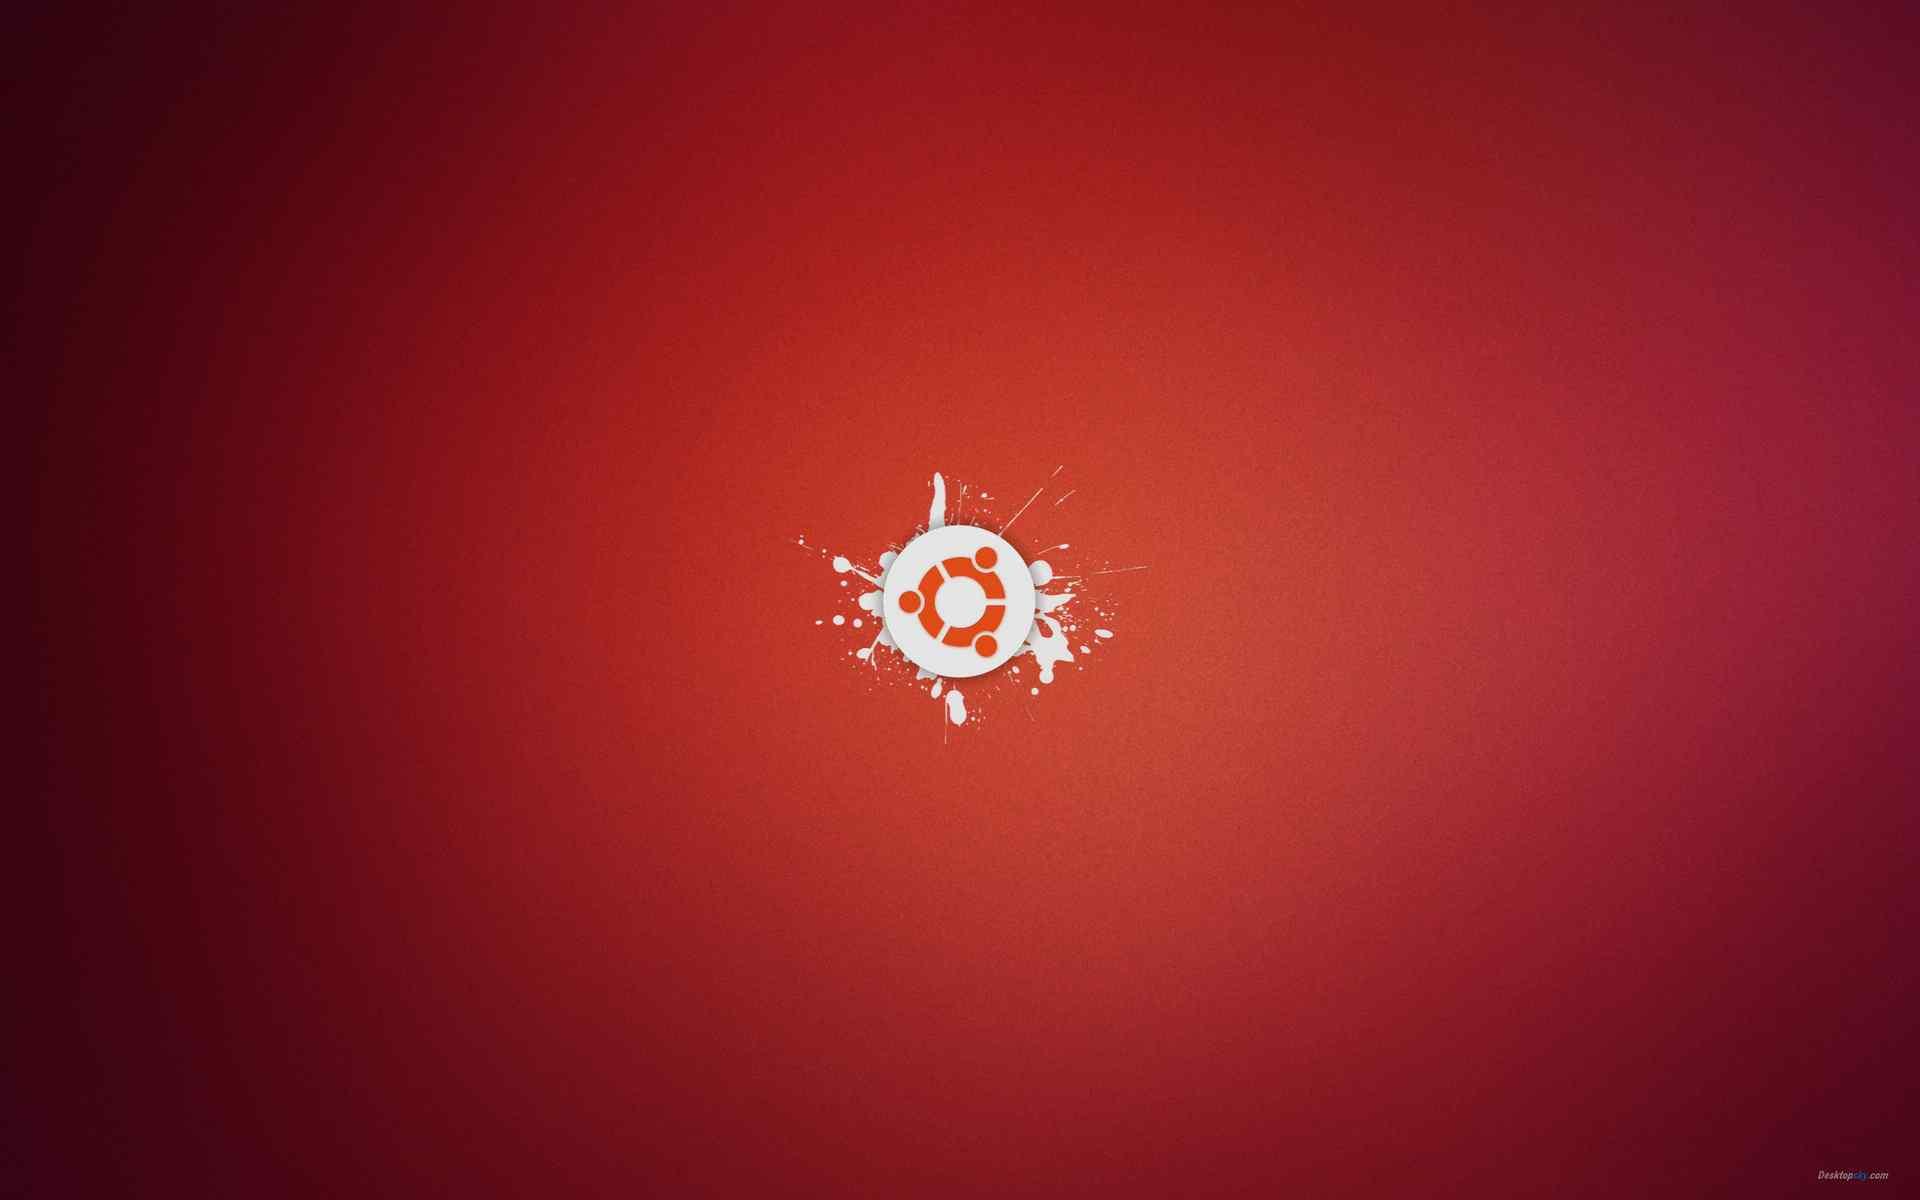 Linux操作系统ubuntu高清电脑桌面壁纸下载(三)